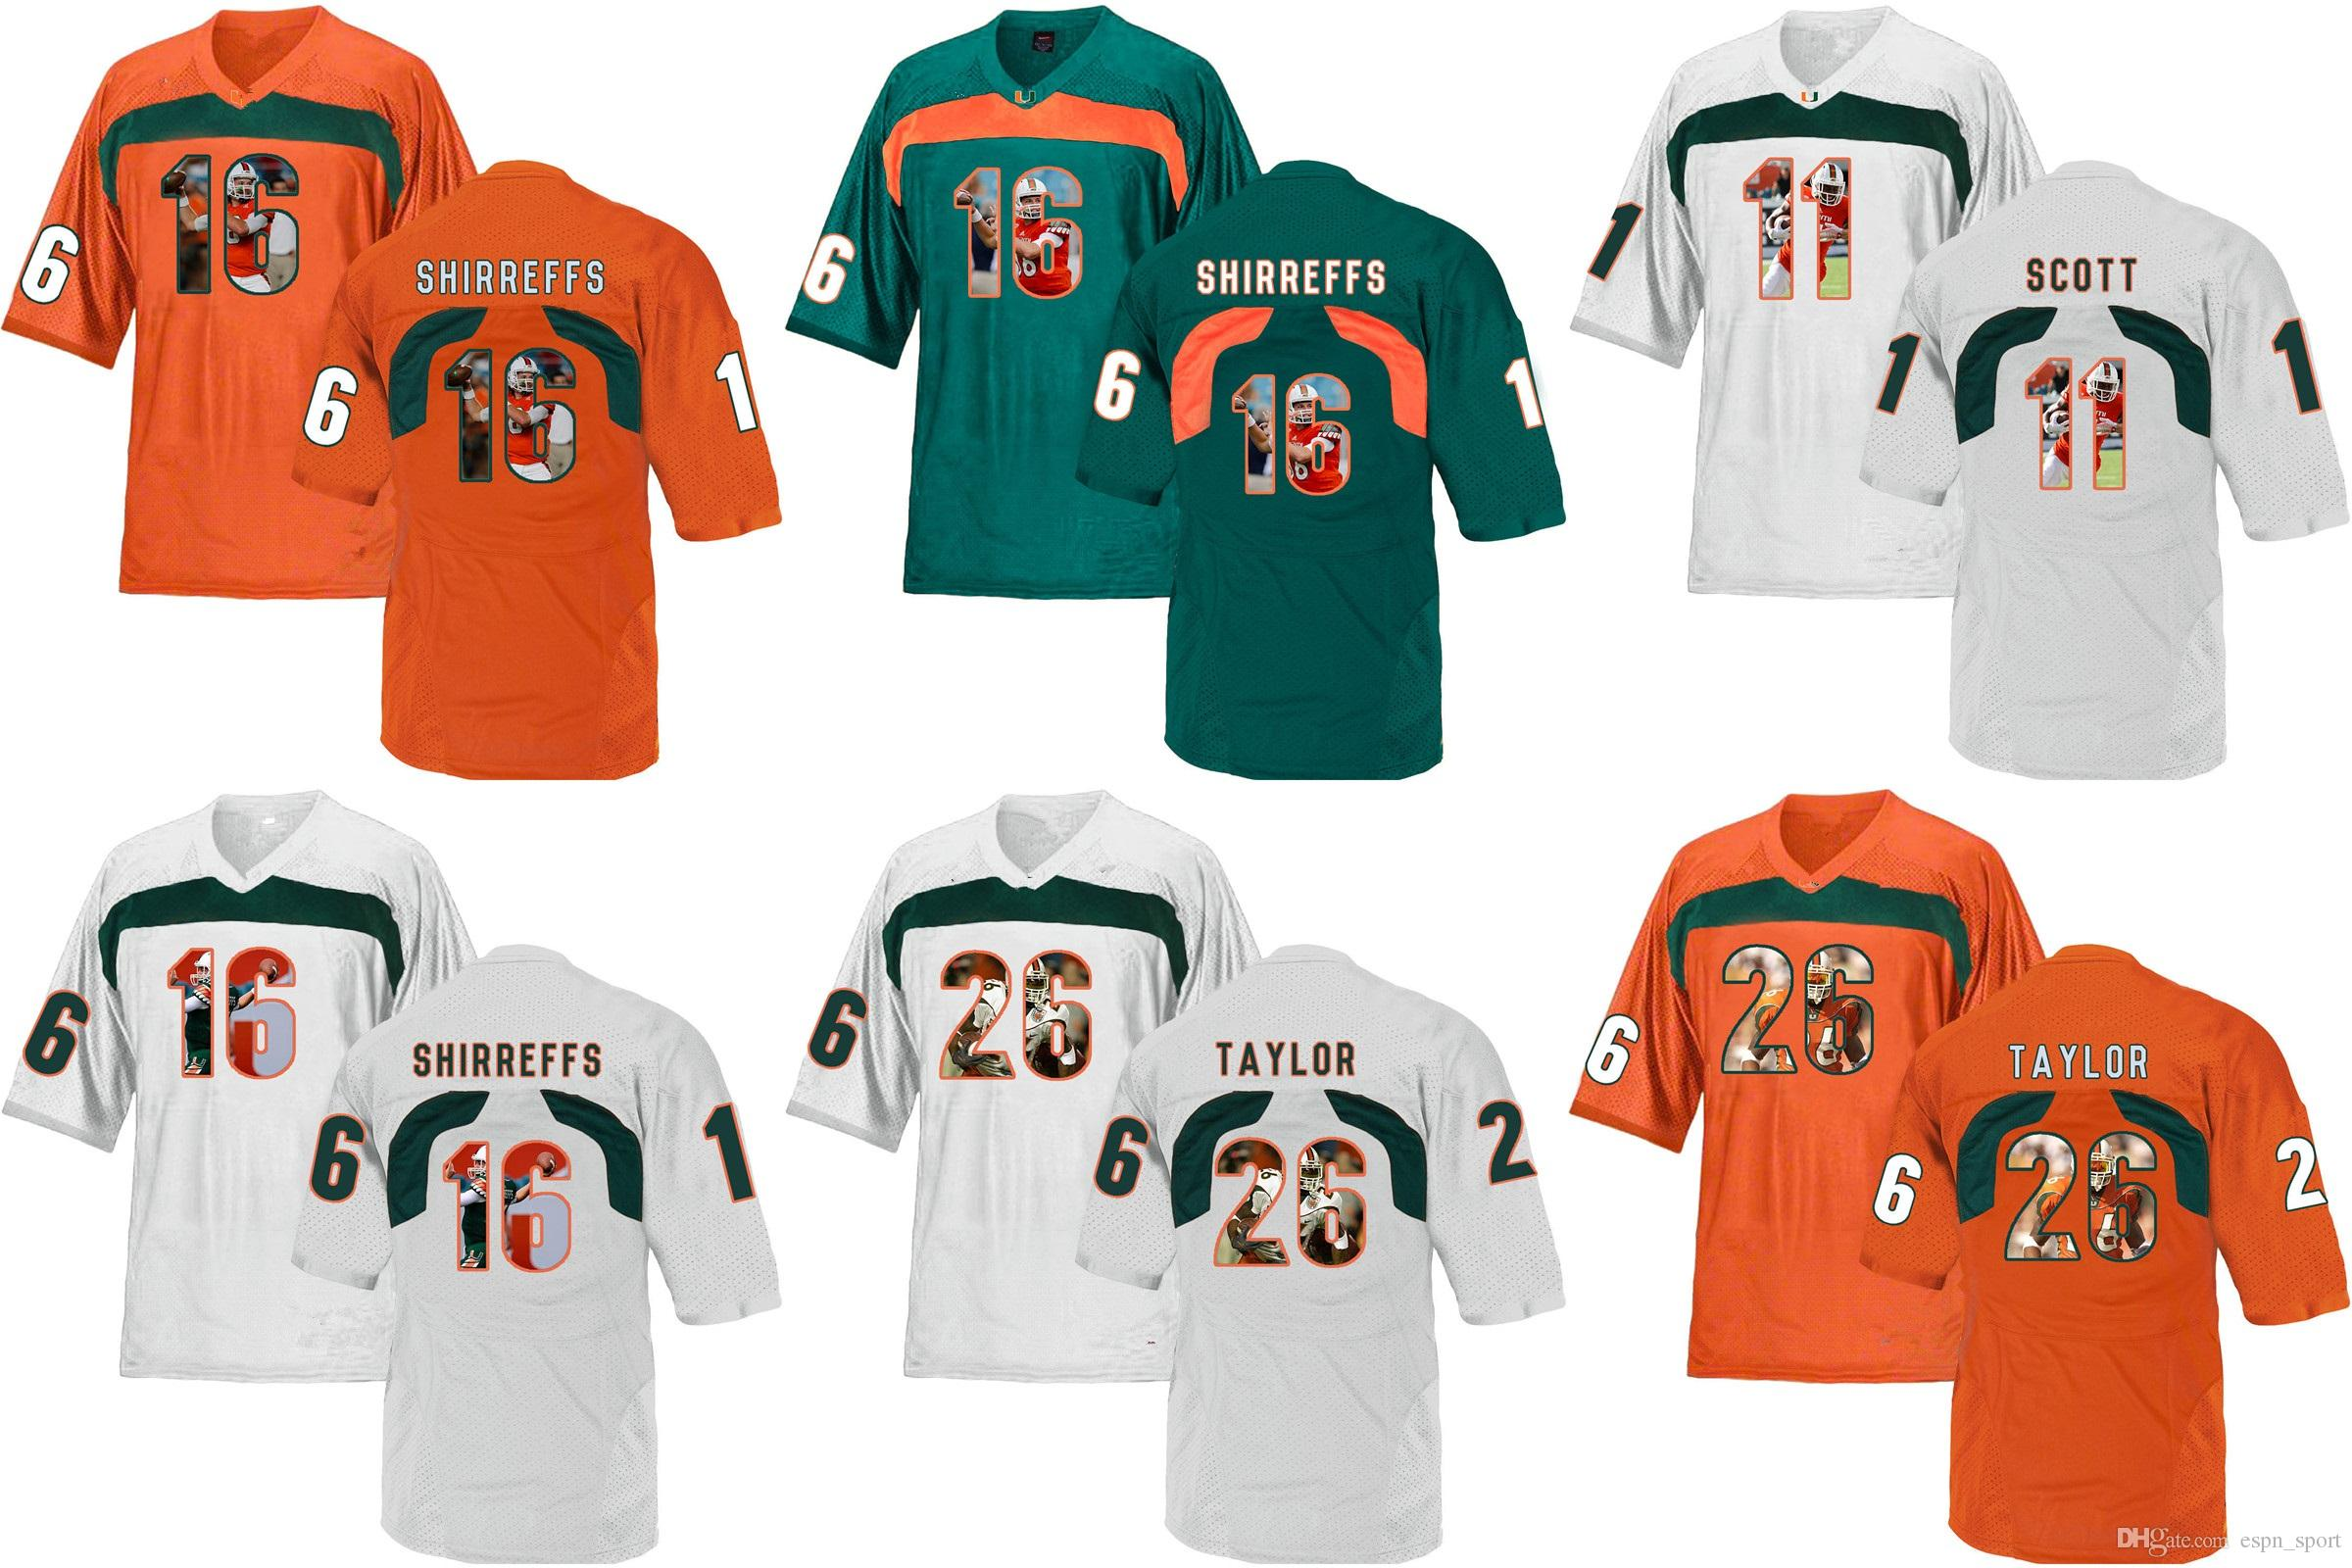 Factory Outlet- NCAA Miami Hurricanes Taylor 26 Shirreffs 16 College ... 7658ba5c6